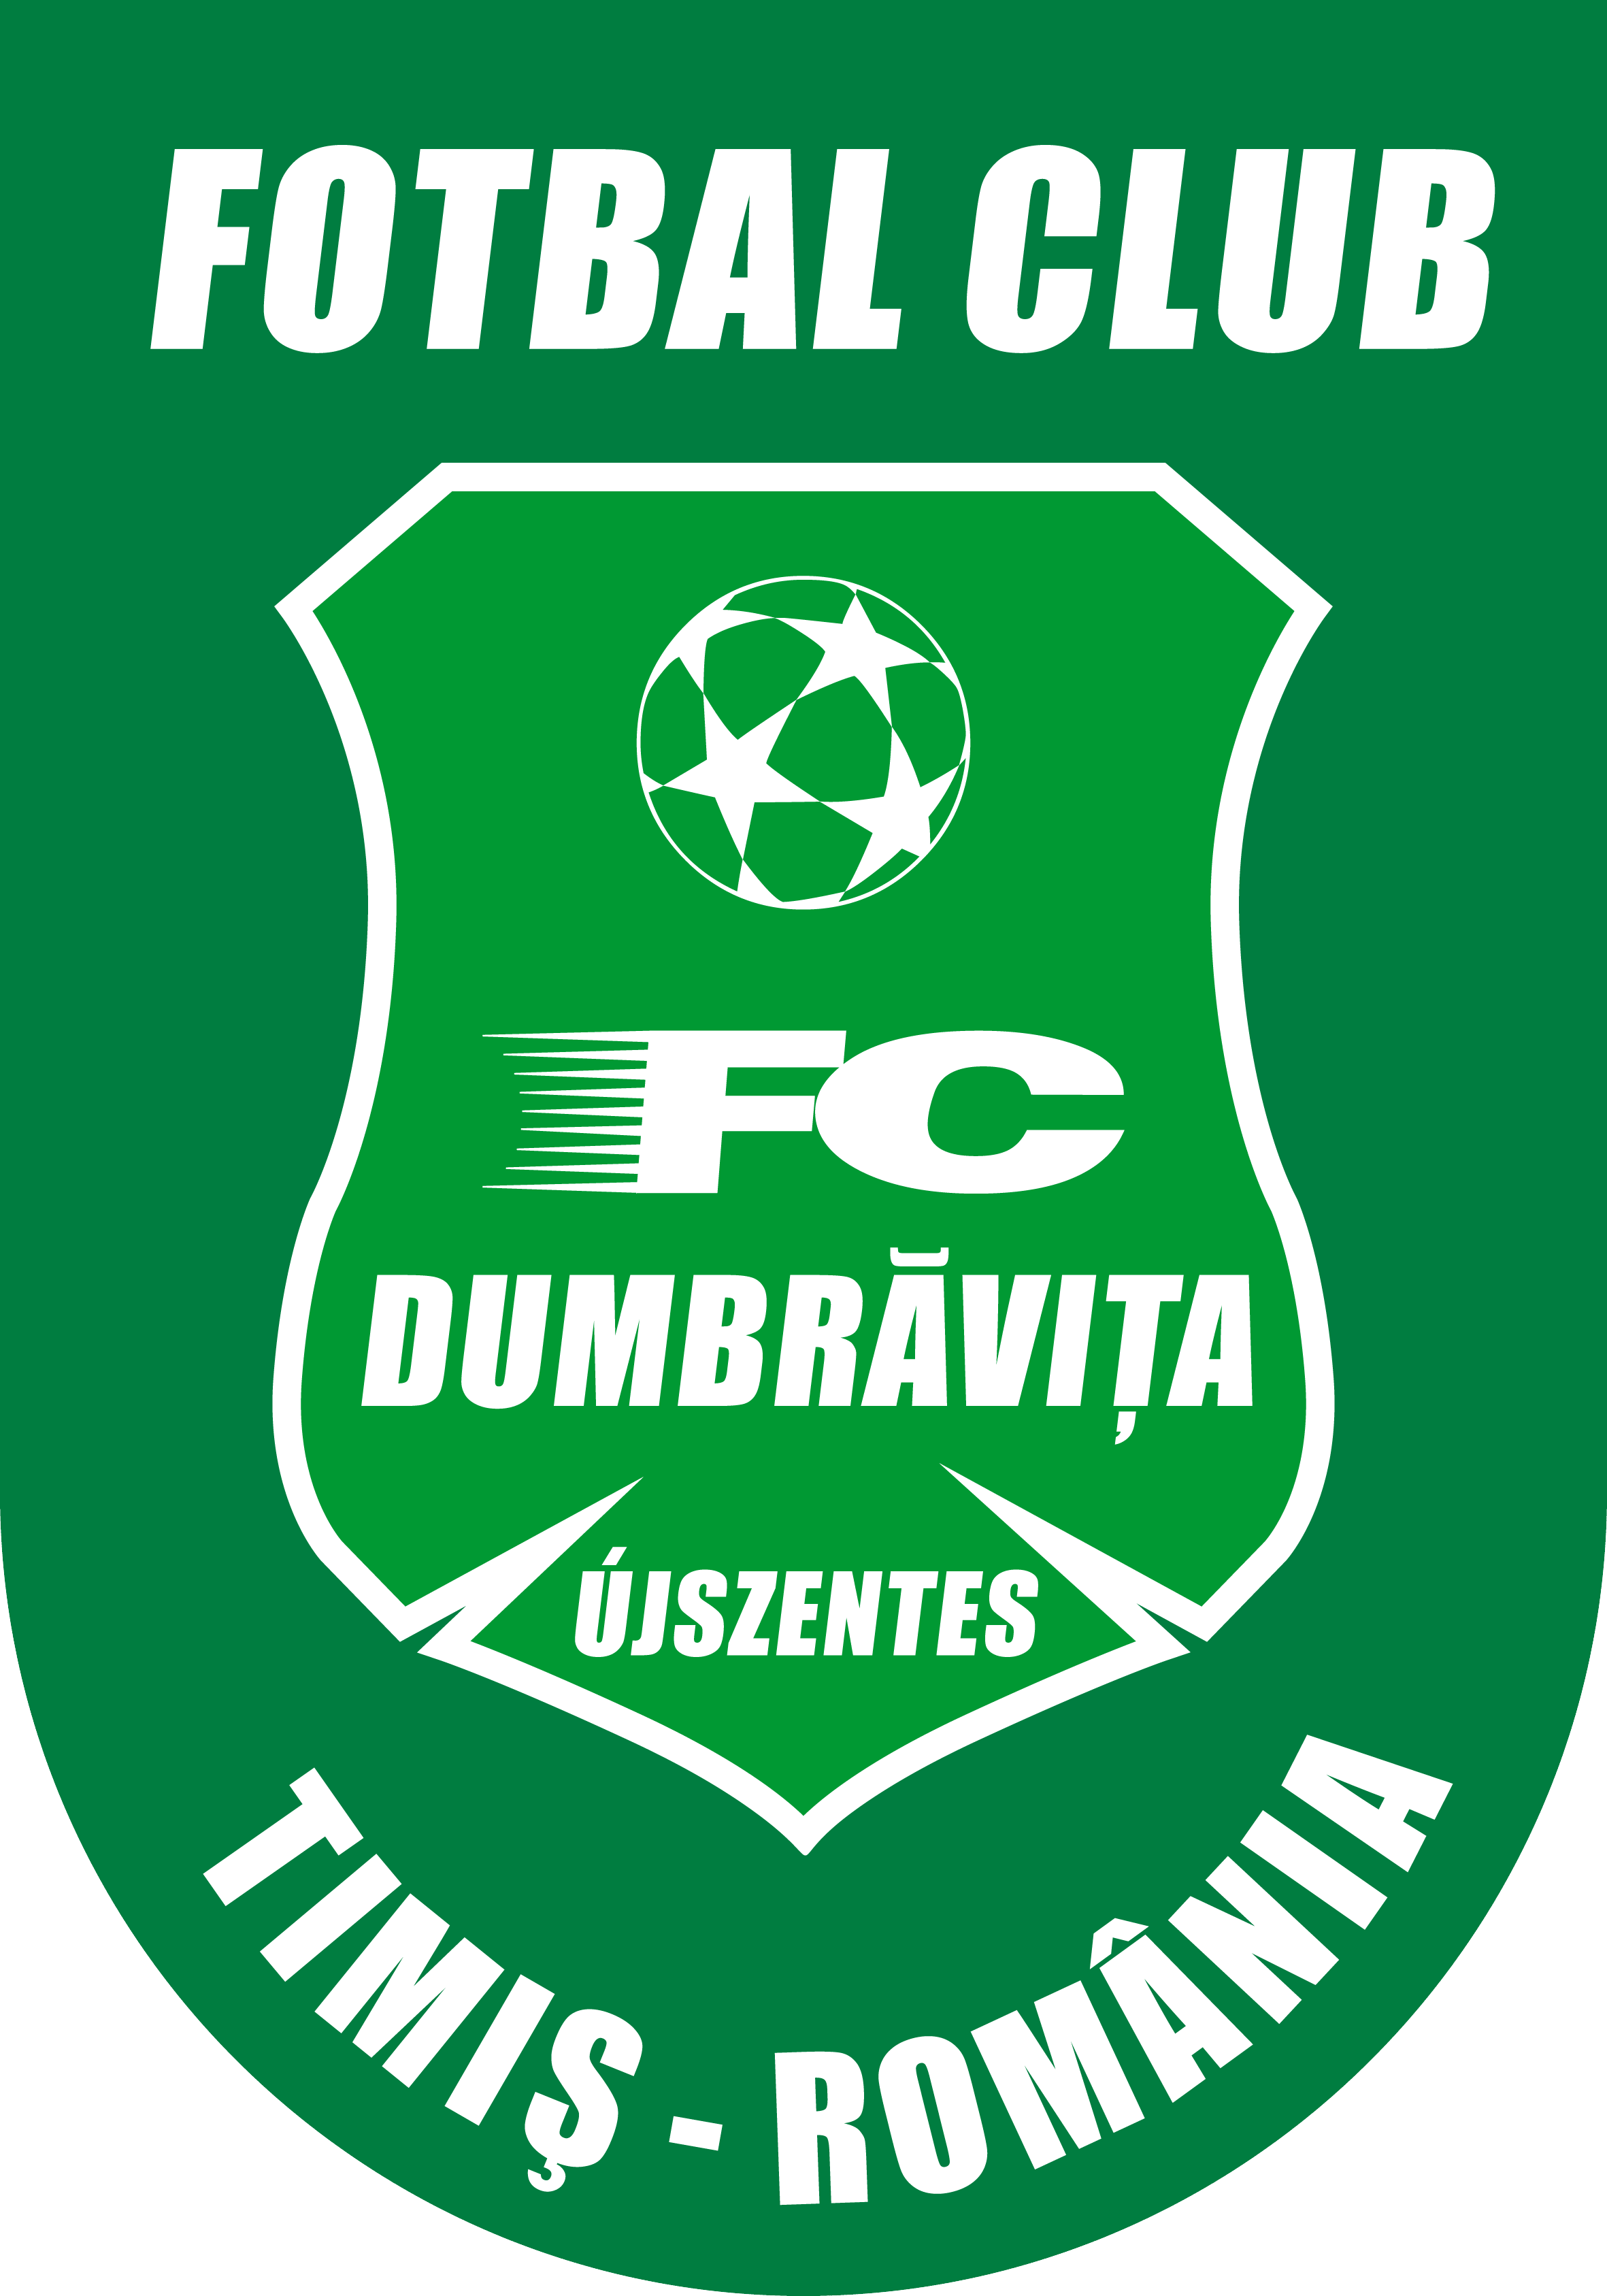 Dumbravita logo